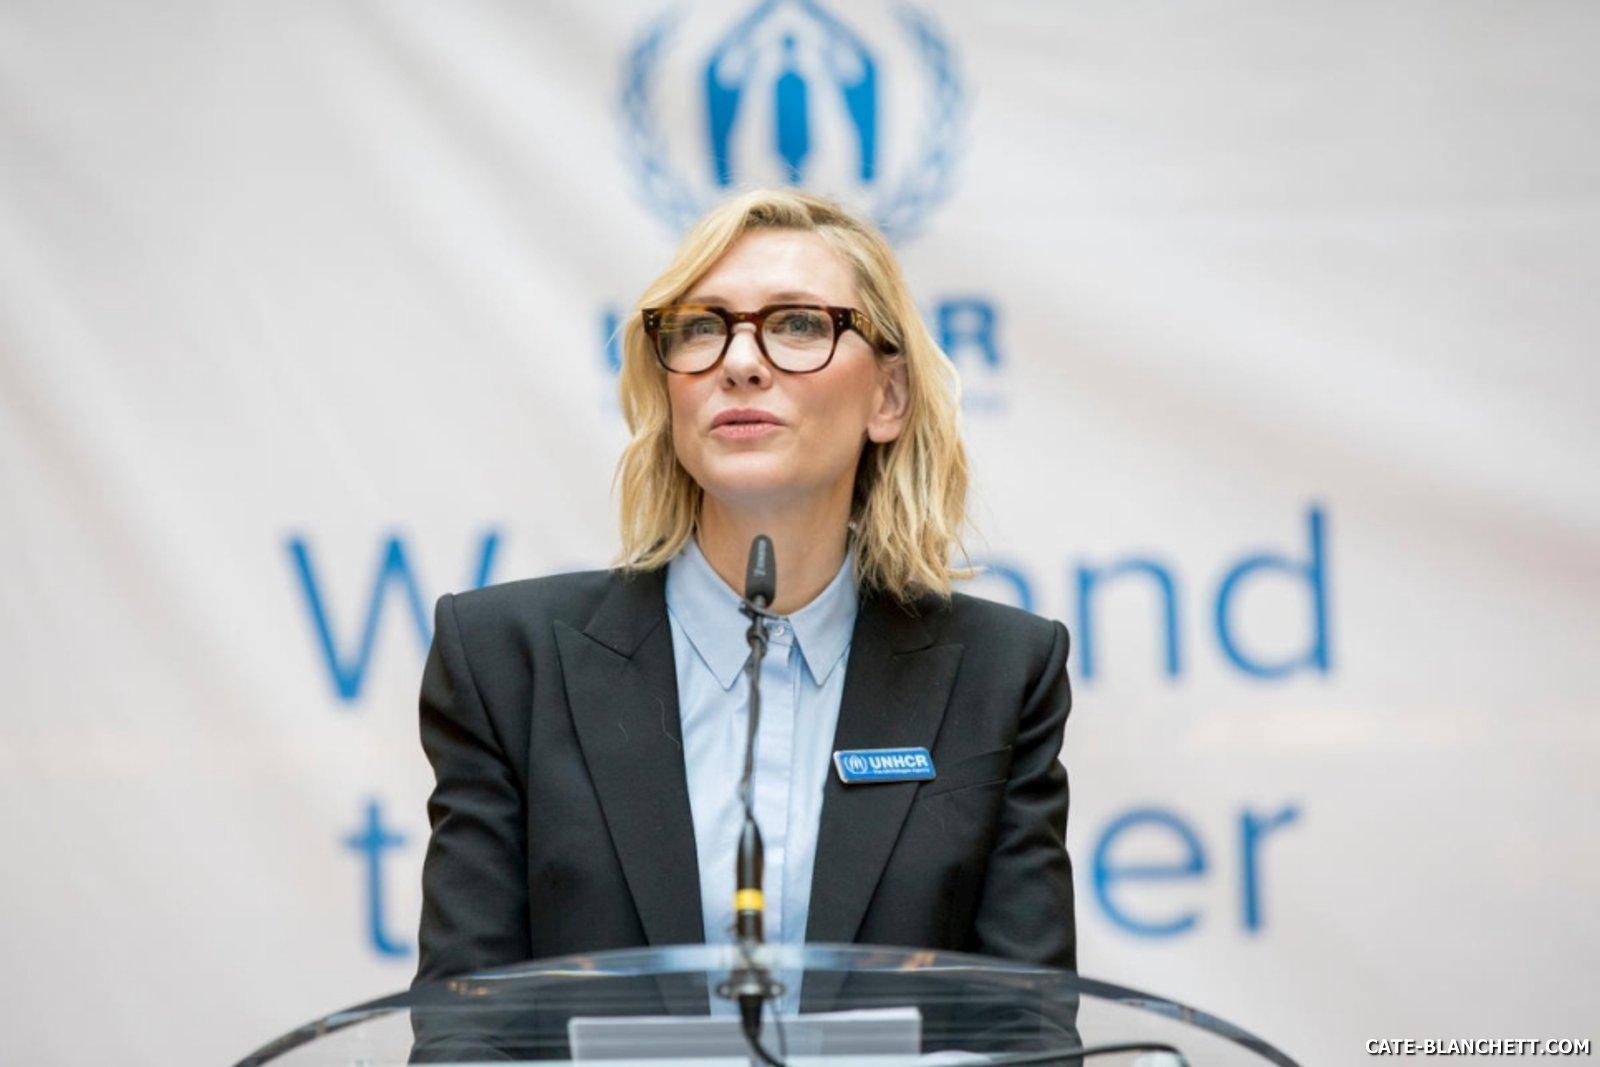 Goodwill ambassador Cate Blanchett visits UNHCR's headquarters in Geneva